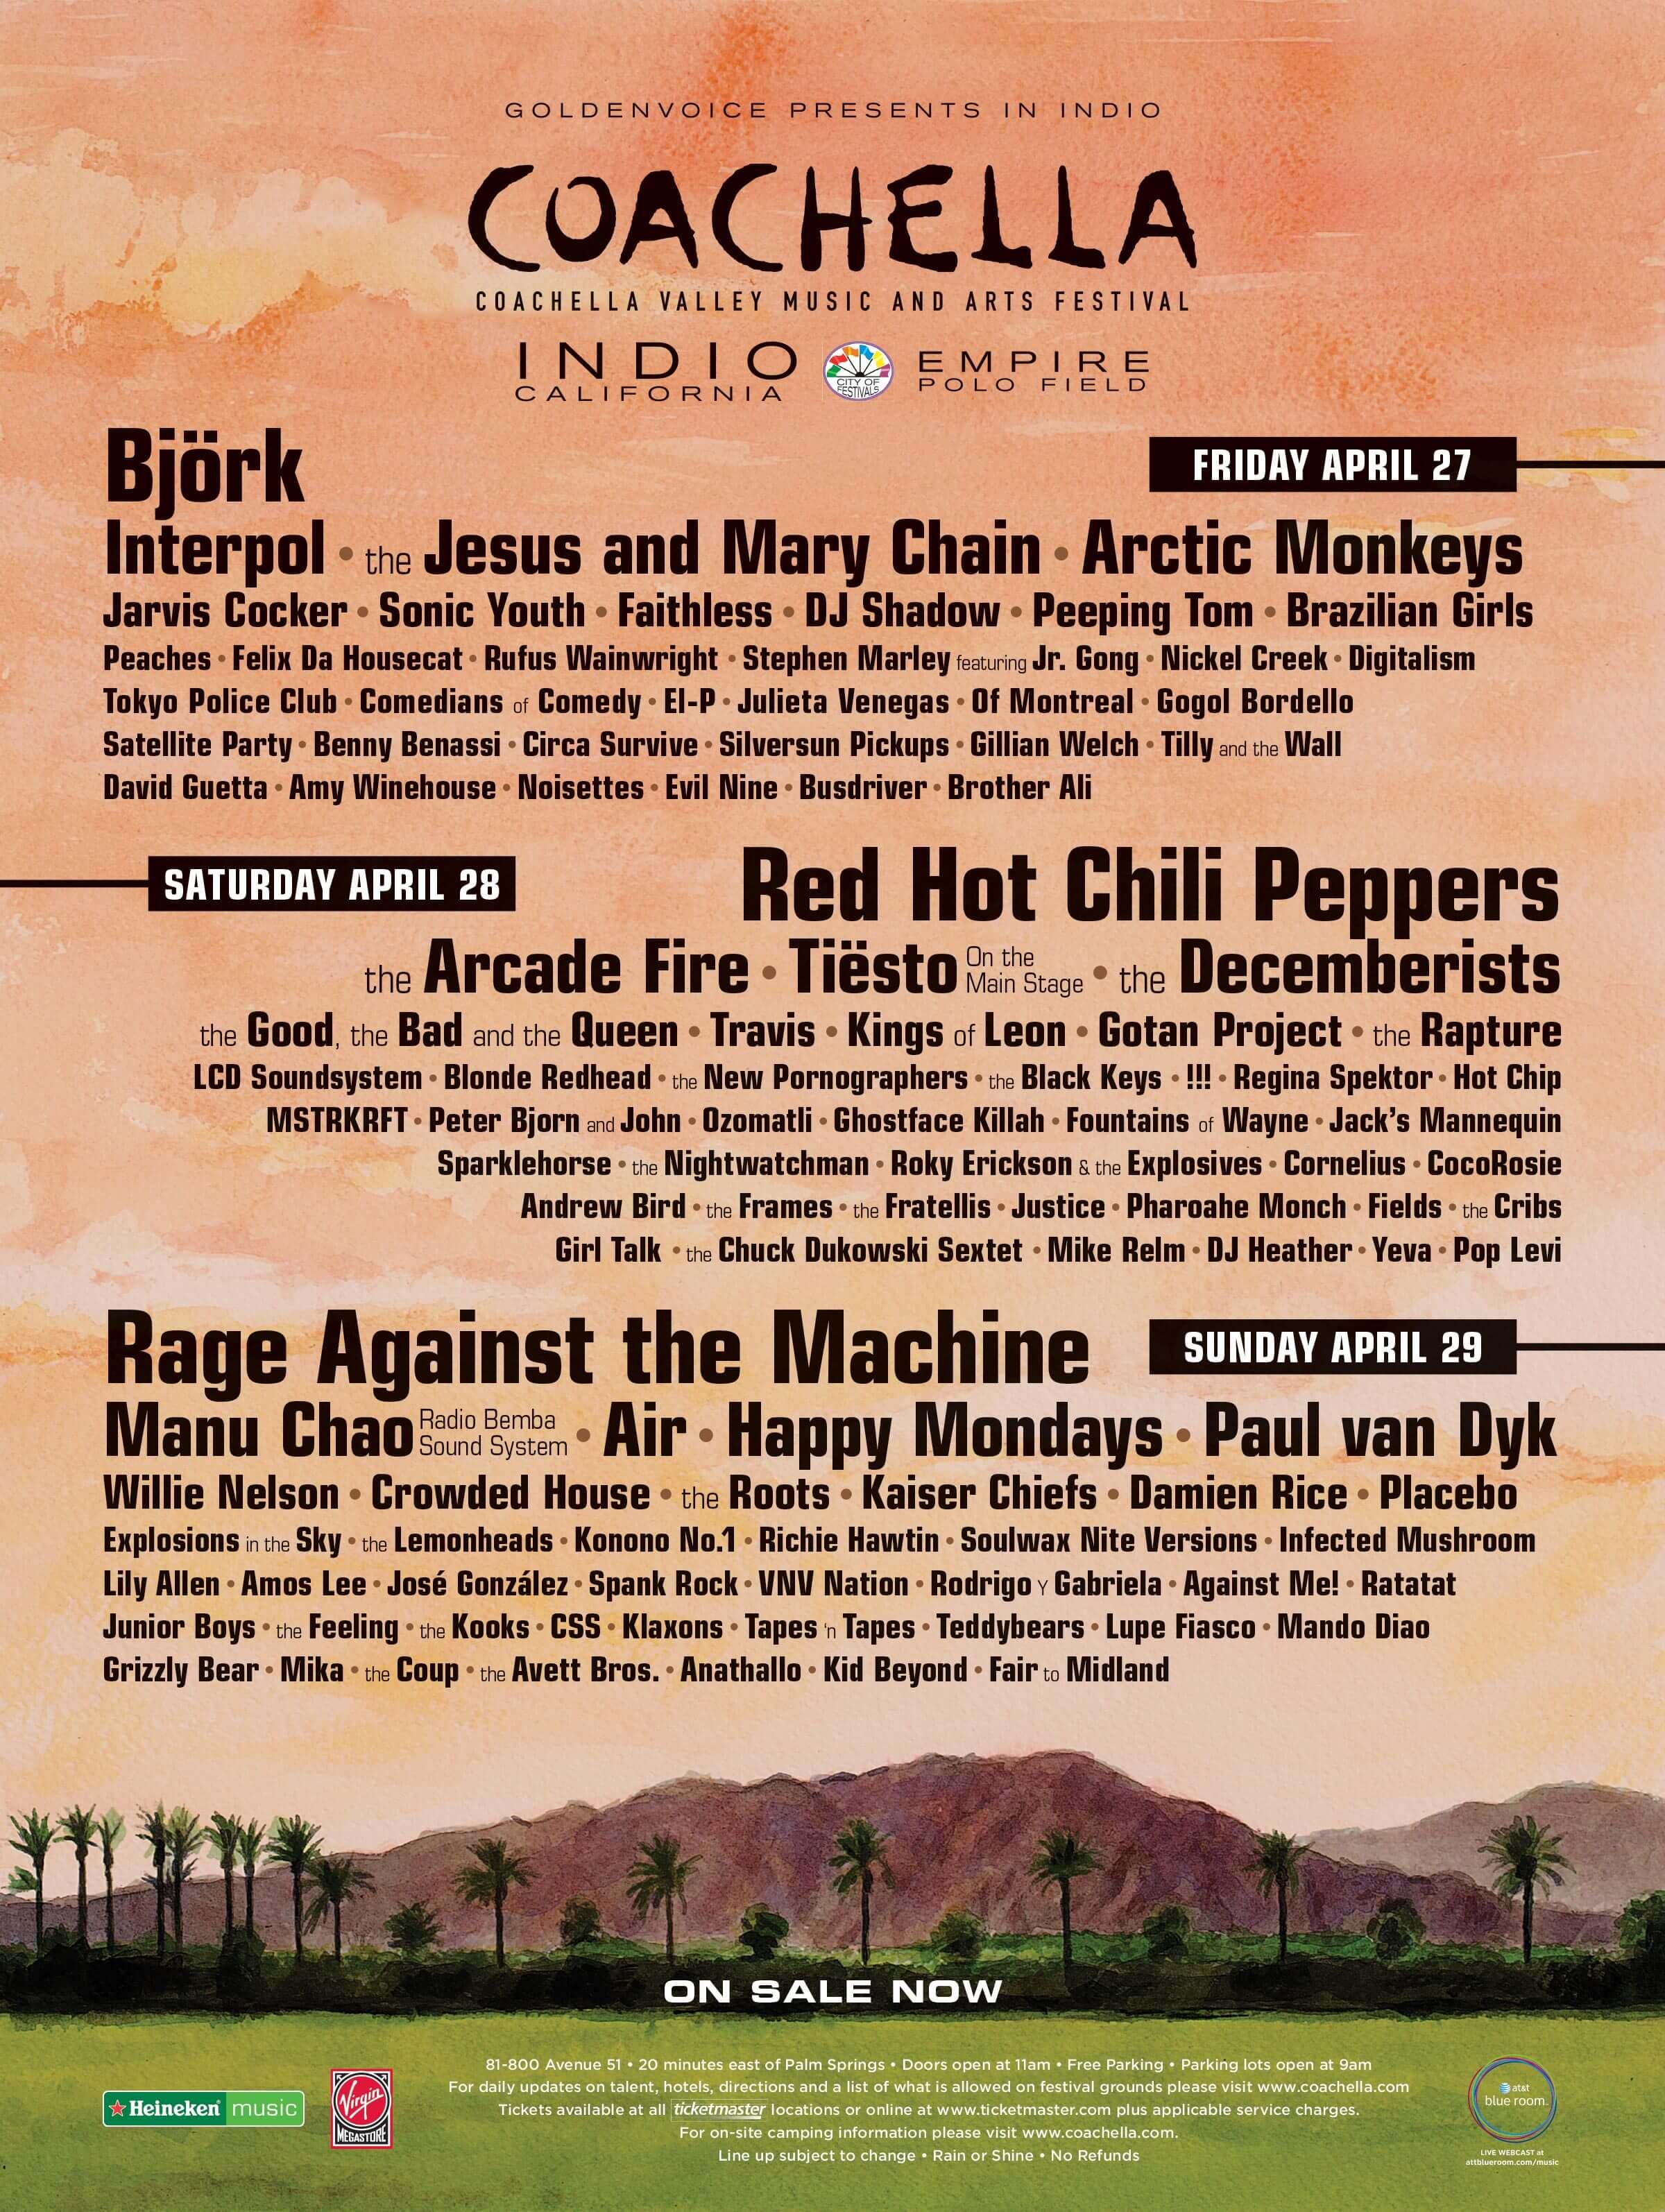 Coachella 2007 Lineup Poster